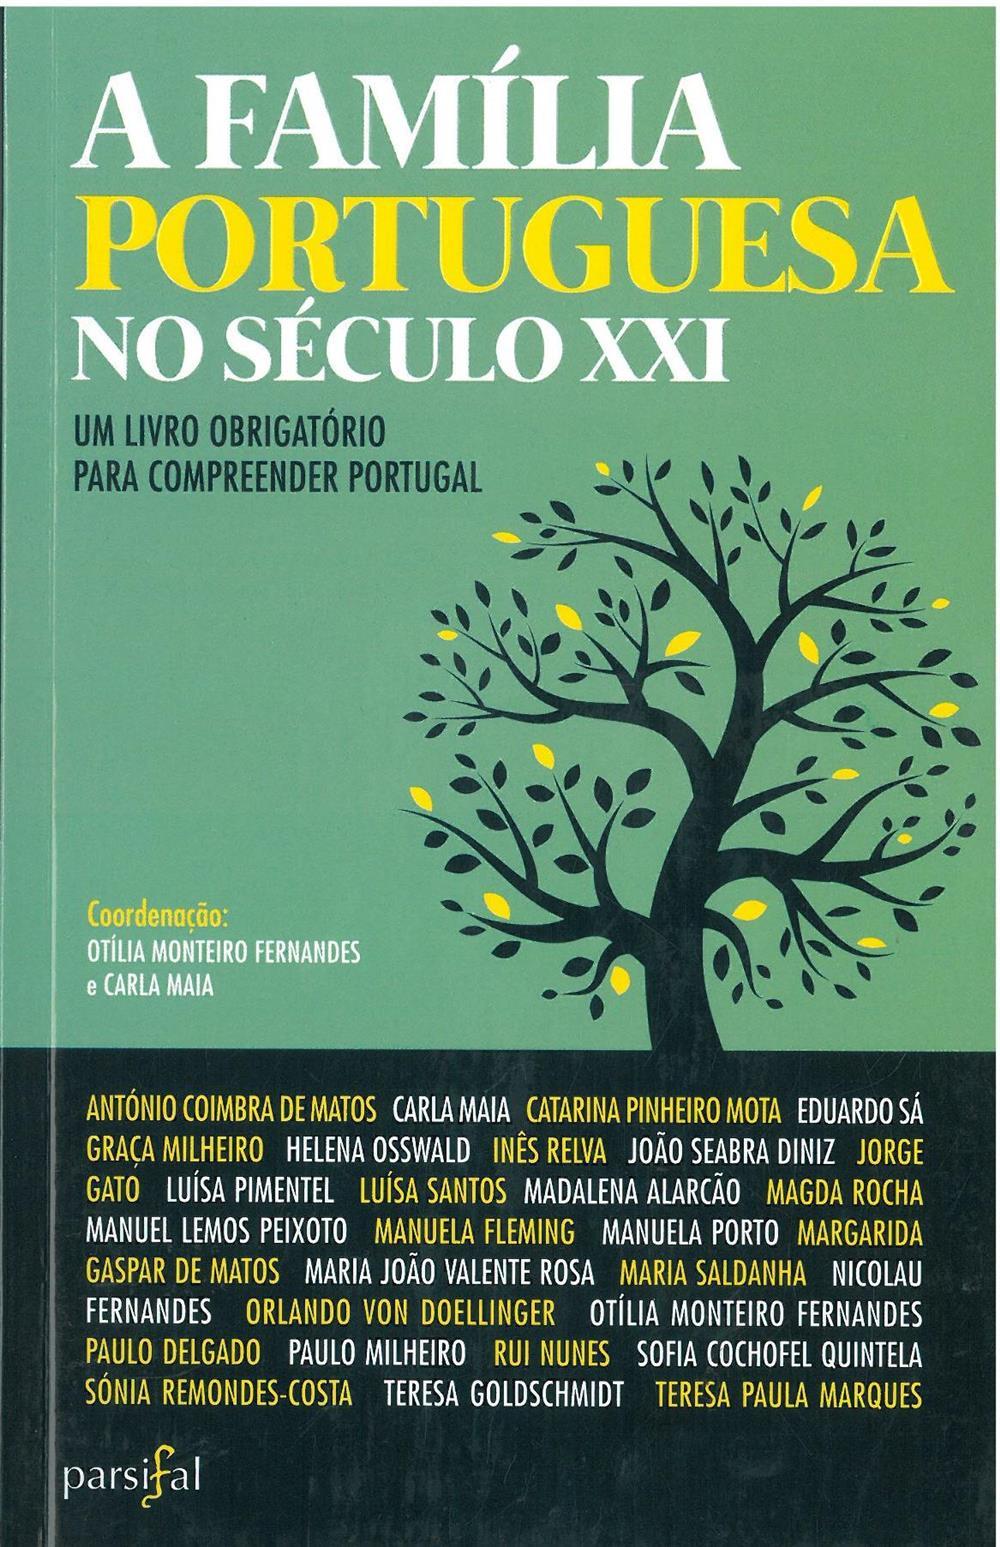 A família portuguesa no século XXI_.jpg